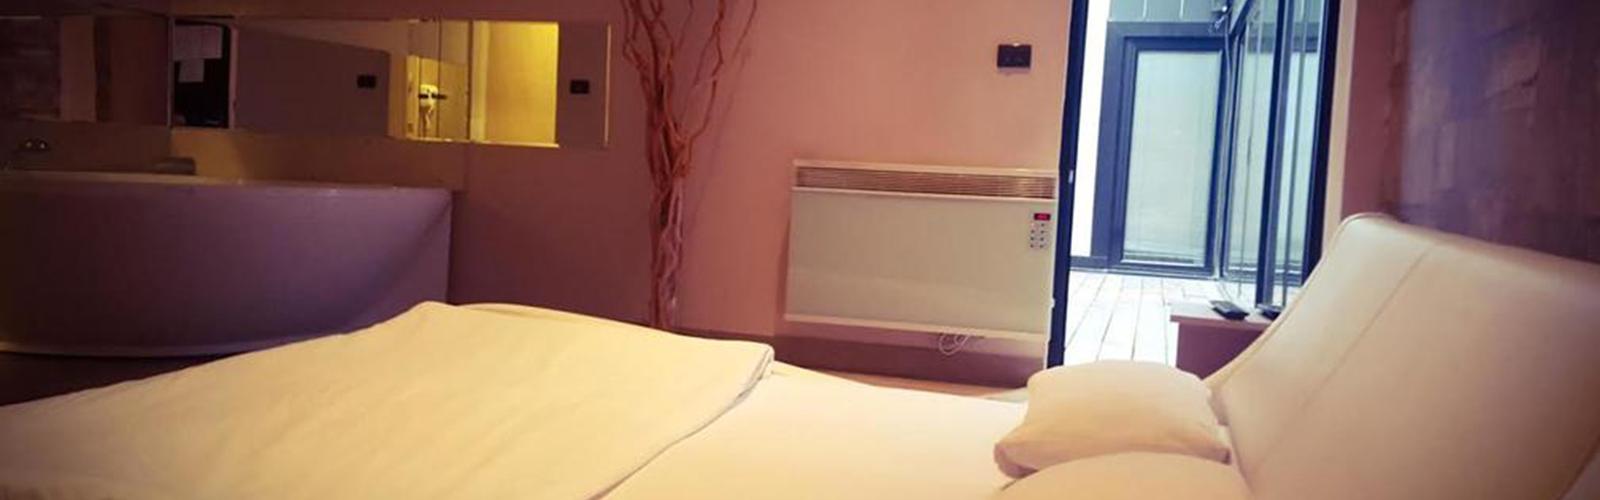 Concierge Belgrade | Apartman na vodi Delta Top 4